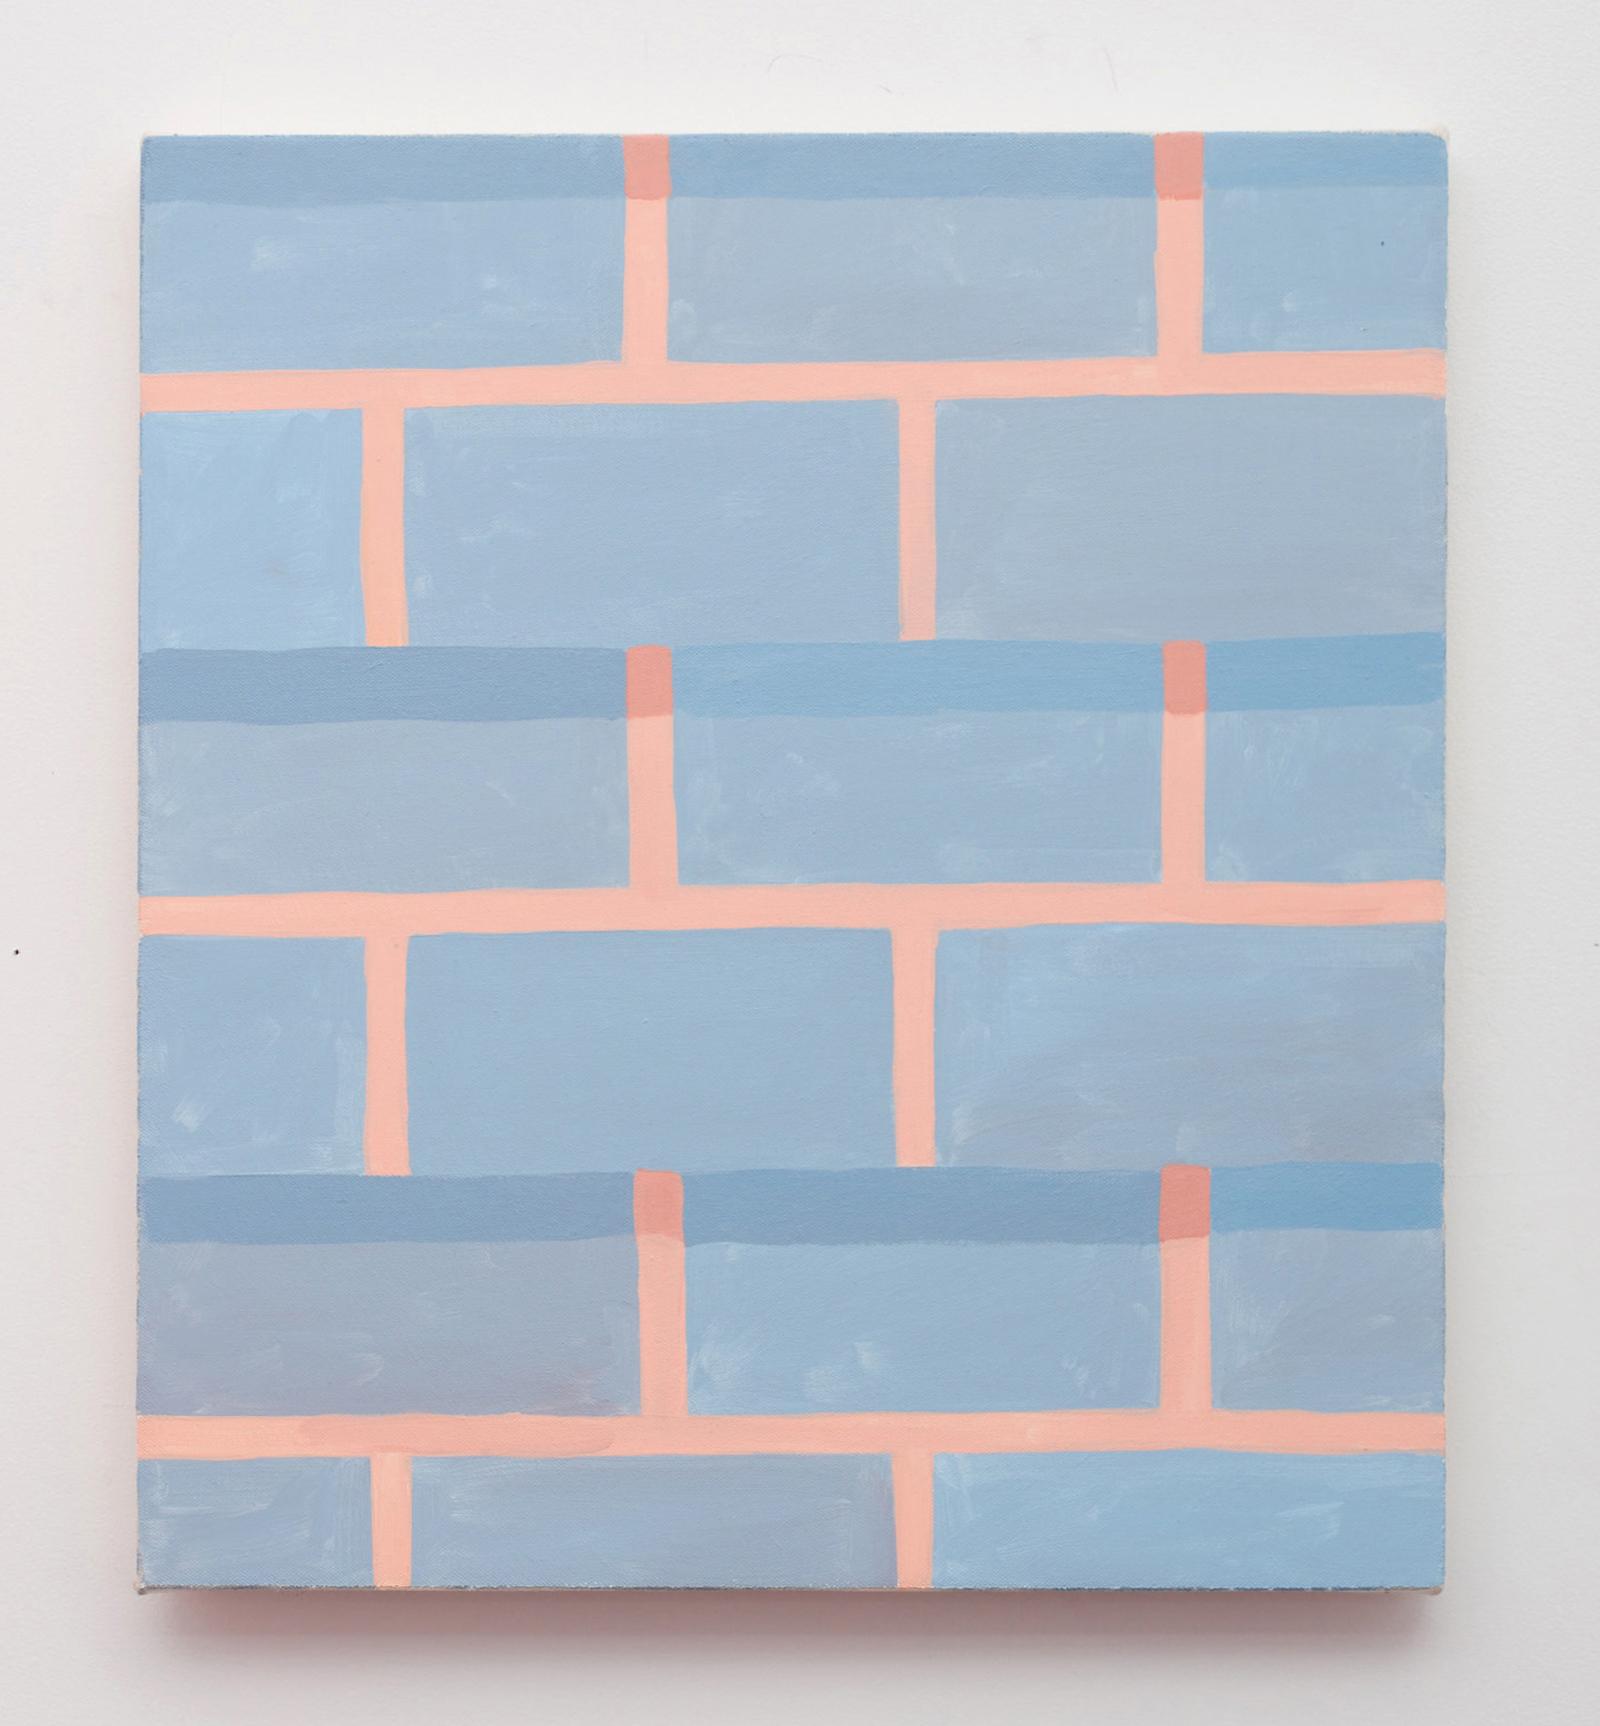 Corydon Cowansage, Wall #7, 2016, 18 x 16 inches, acrylic on canvas